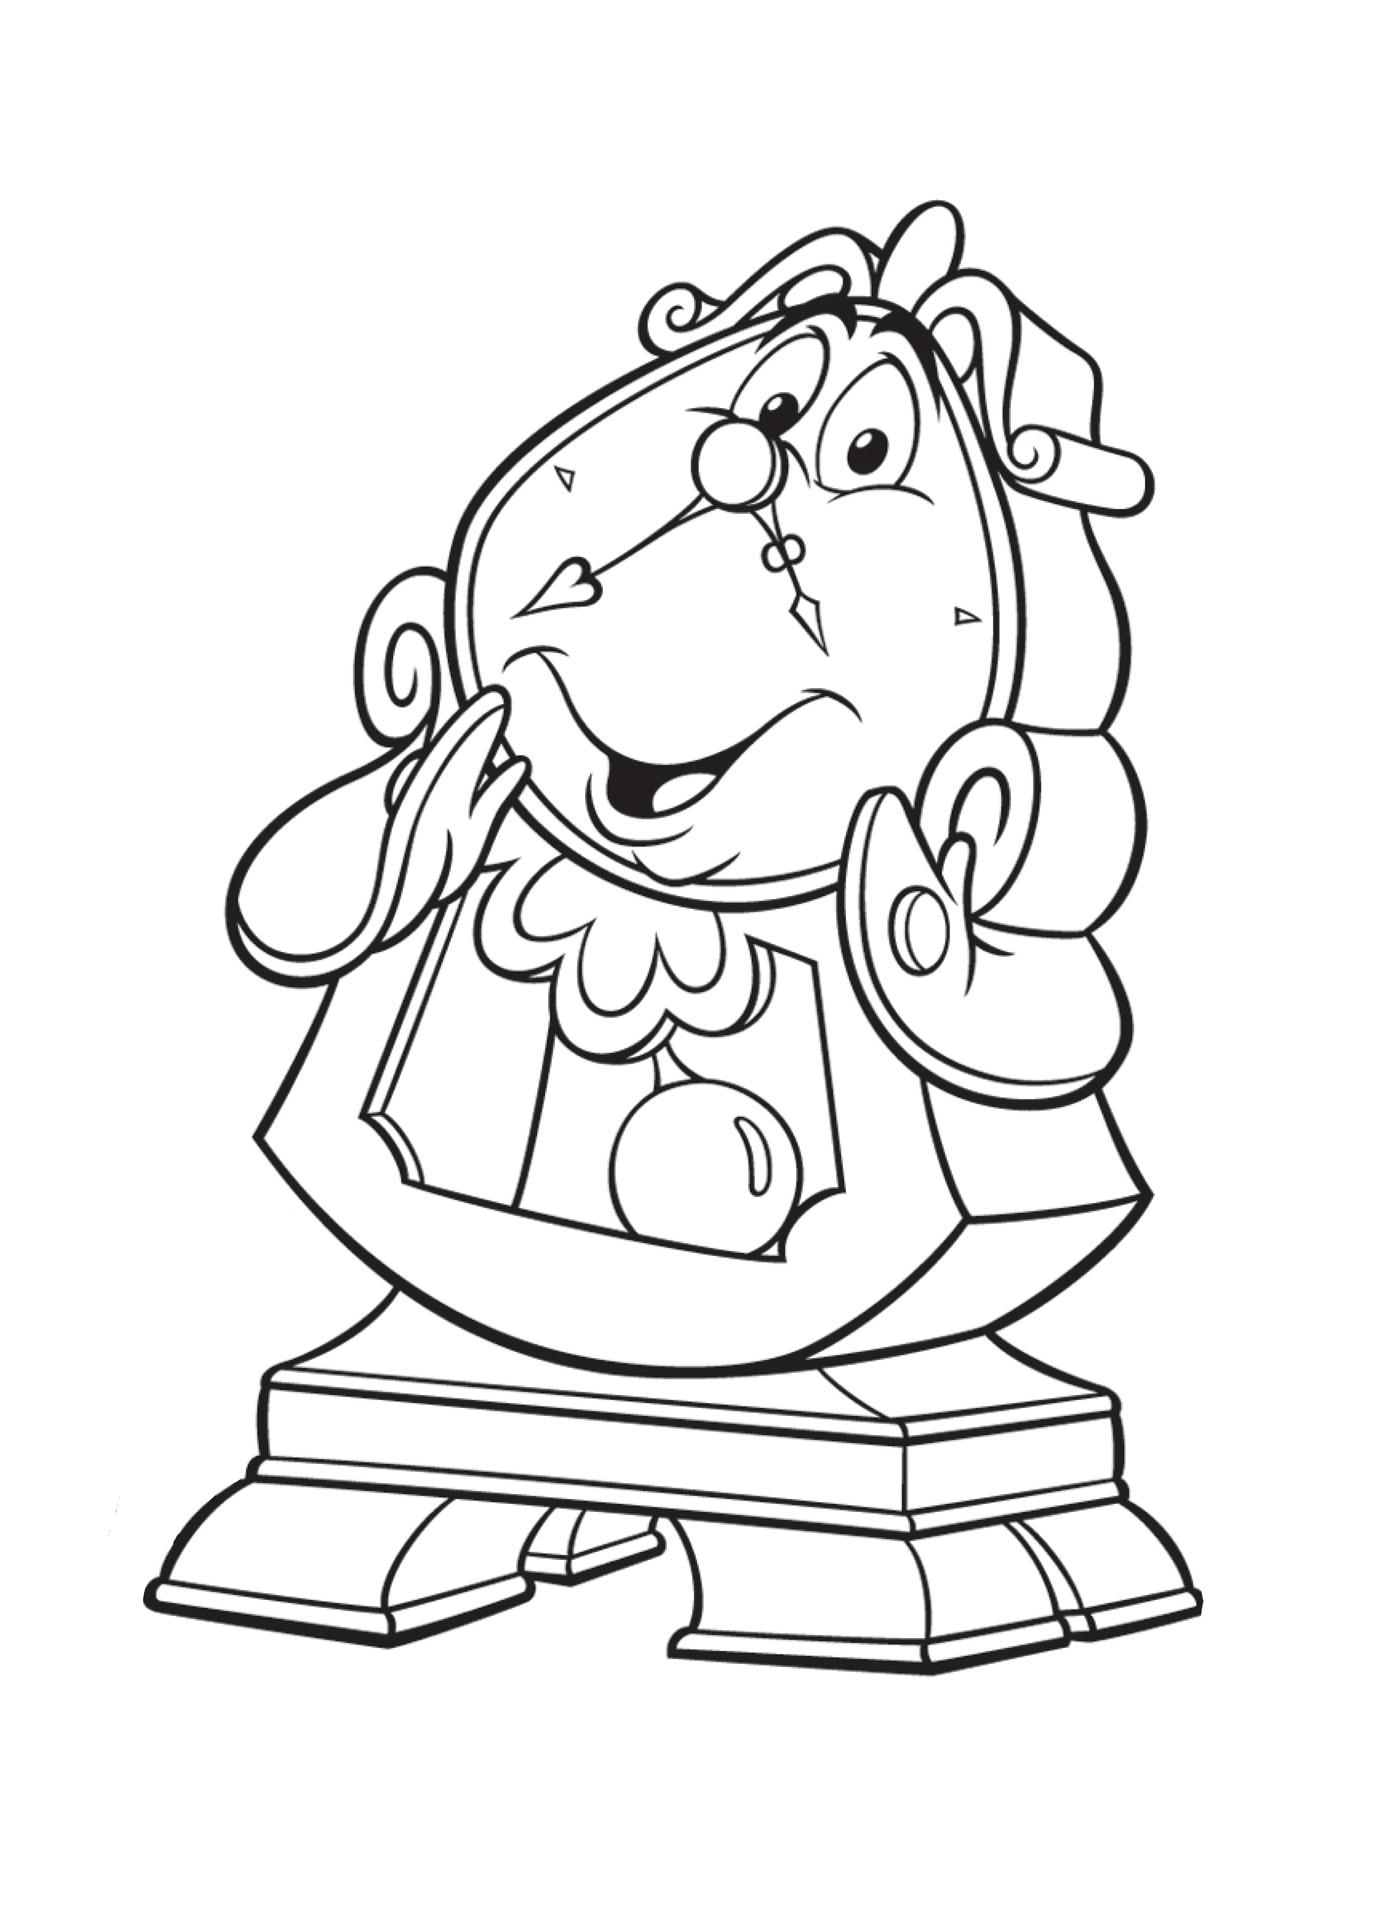 раскраски по мотивам сказки красавица и чудовище для детей